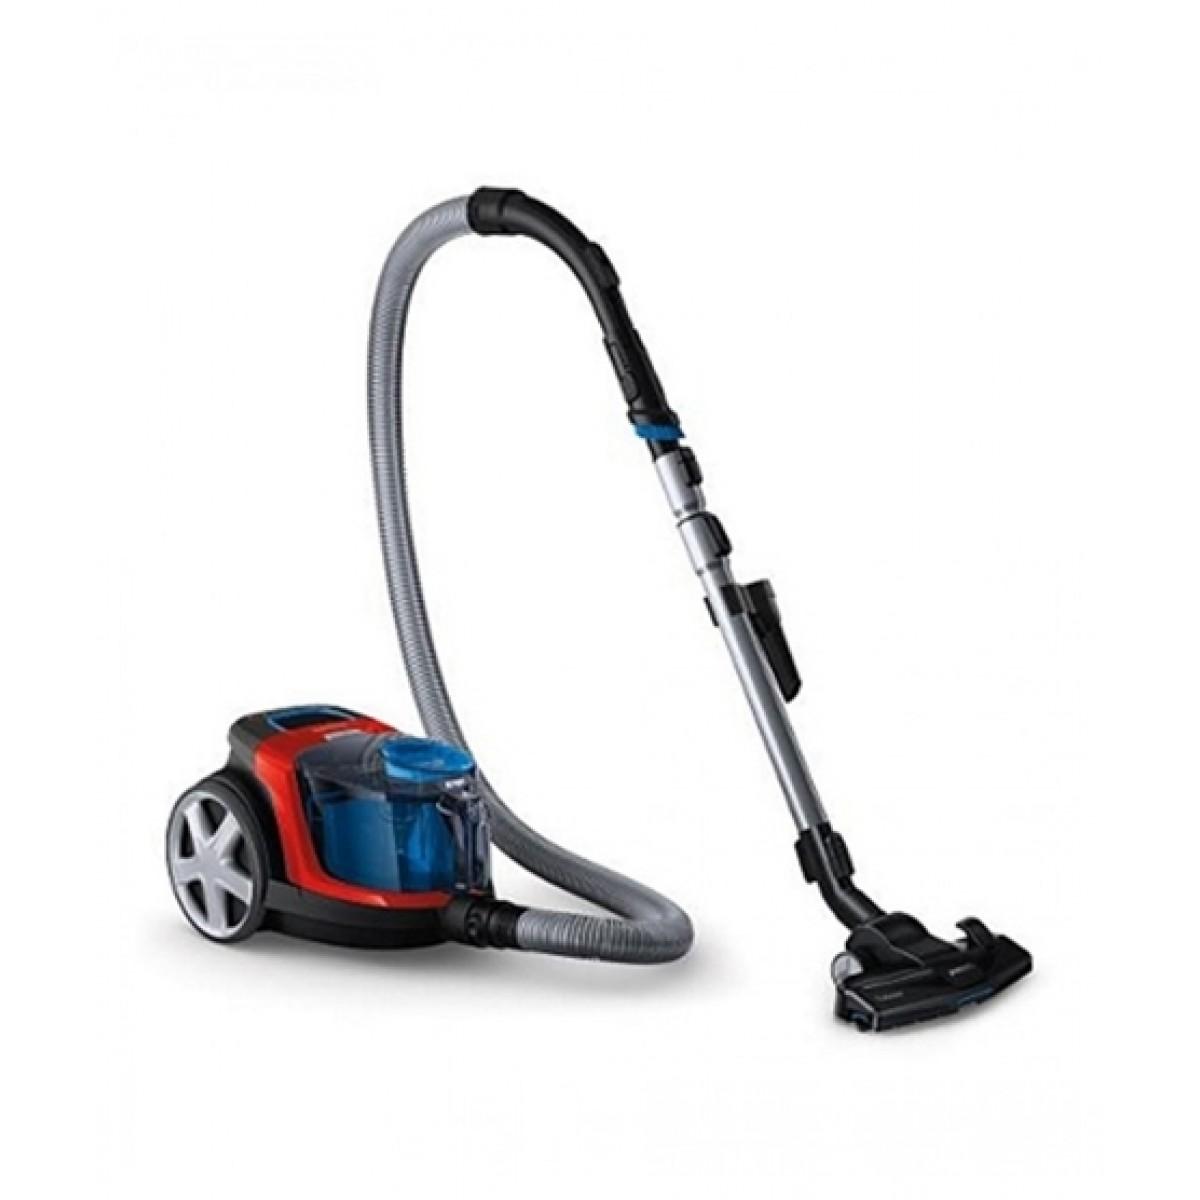 Philips PowerPro Bagless Vacuum Cleaner (FC9351/01)